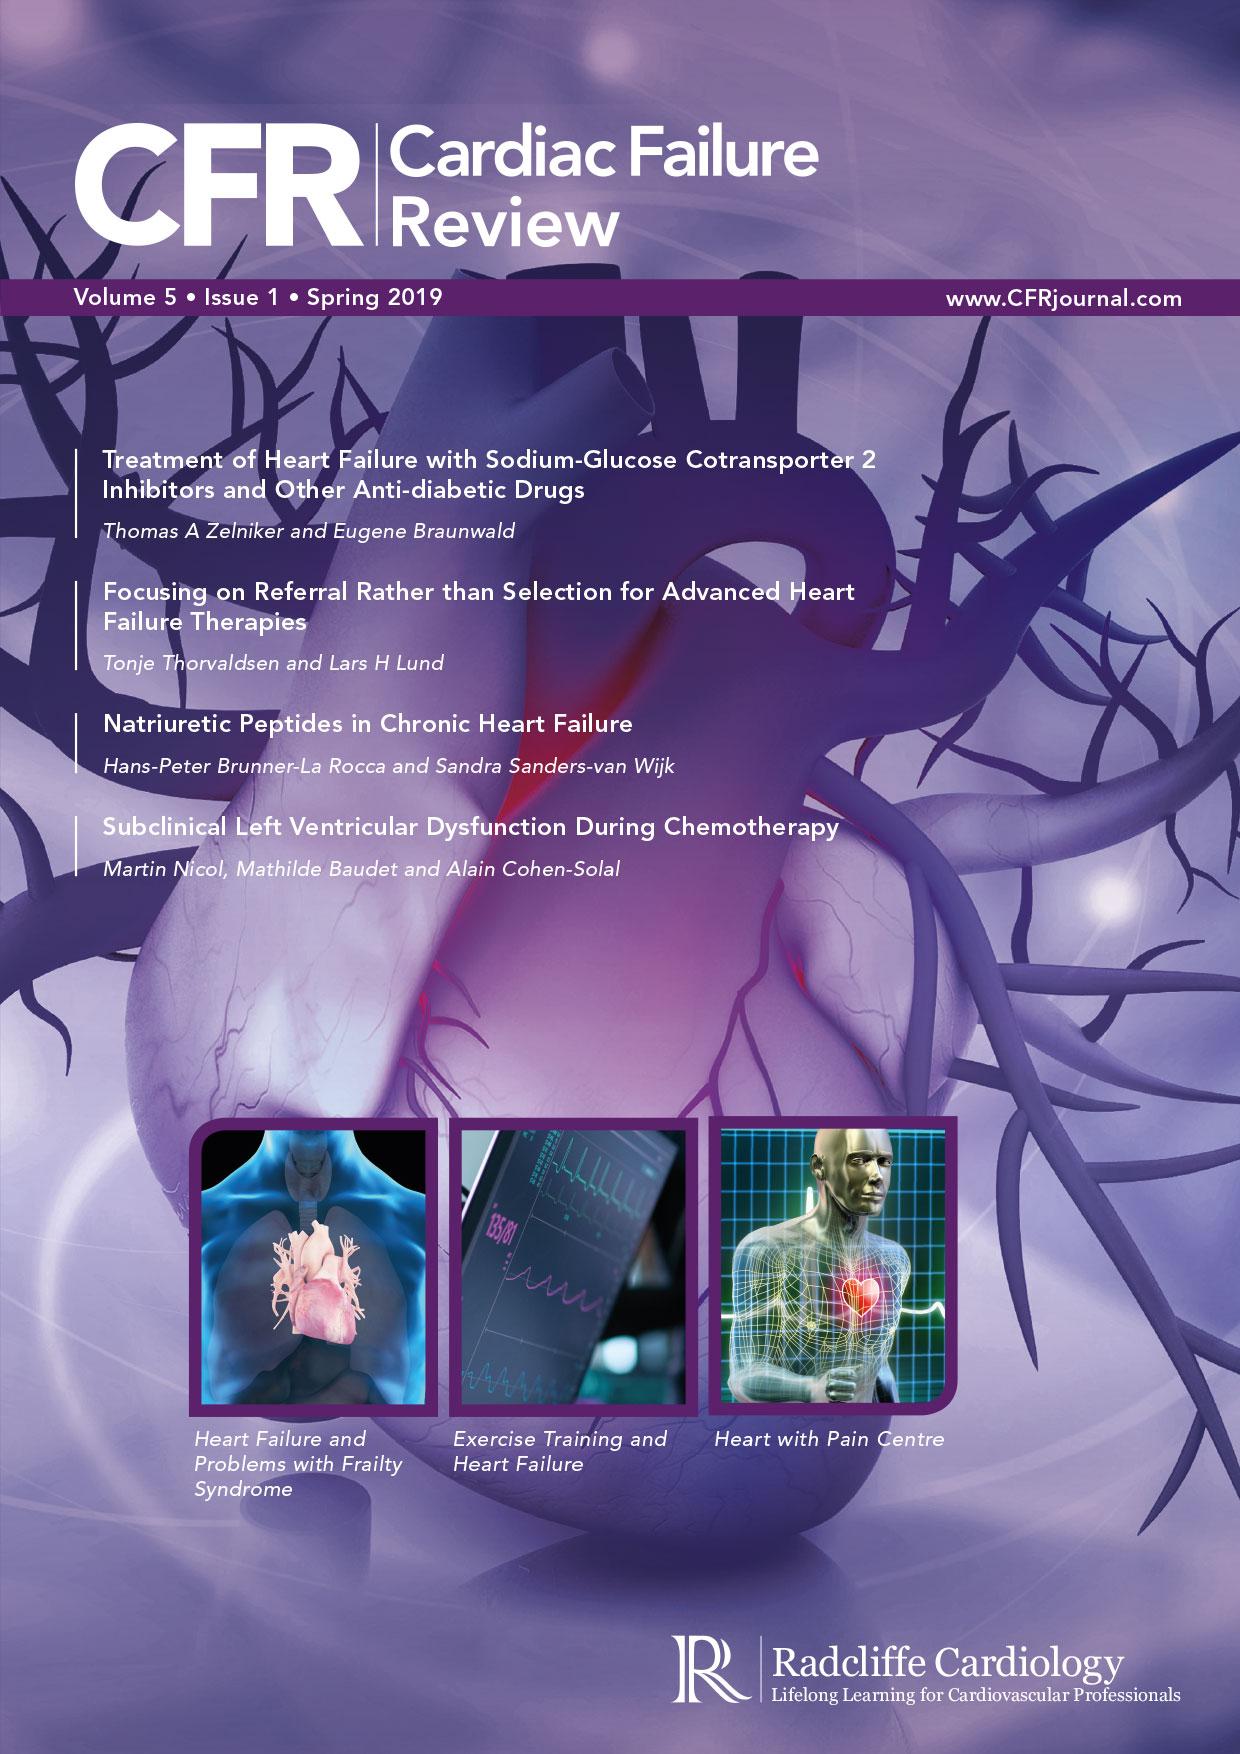 CFR - Volume 5 Issue 1 Spring 2019